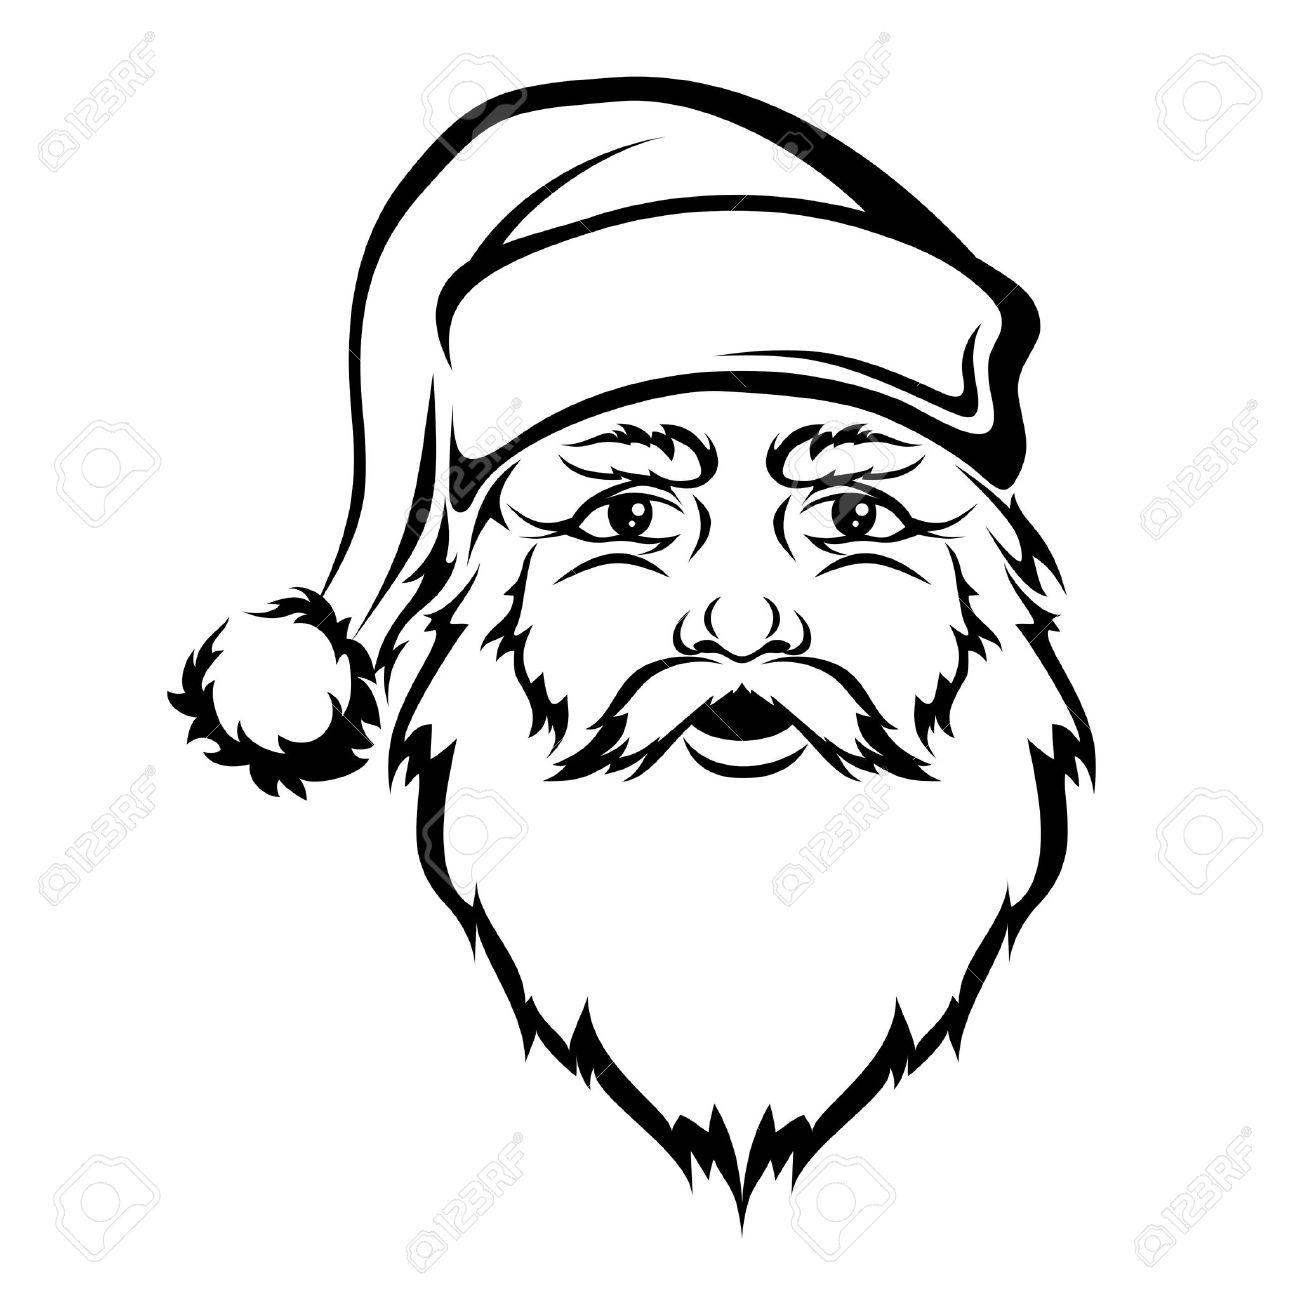 Santa Claus Head Vector Black Contour Christmas Illustration